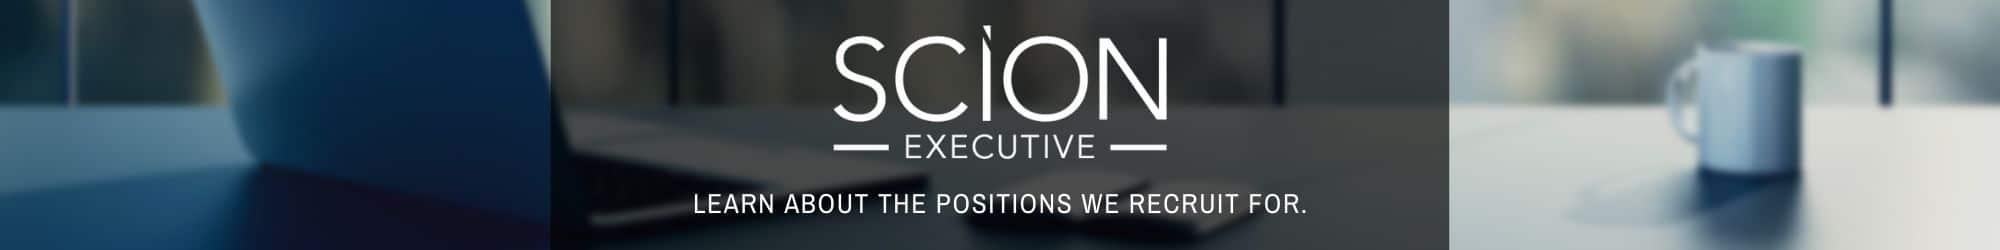 Scion Executive Search Process